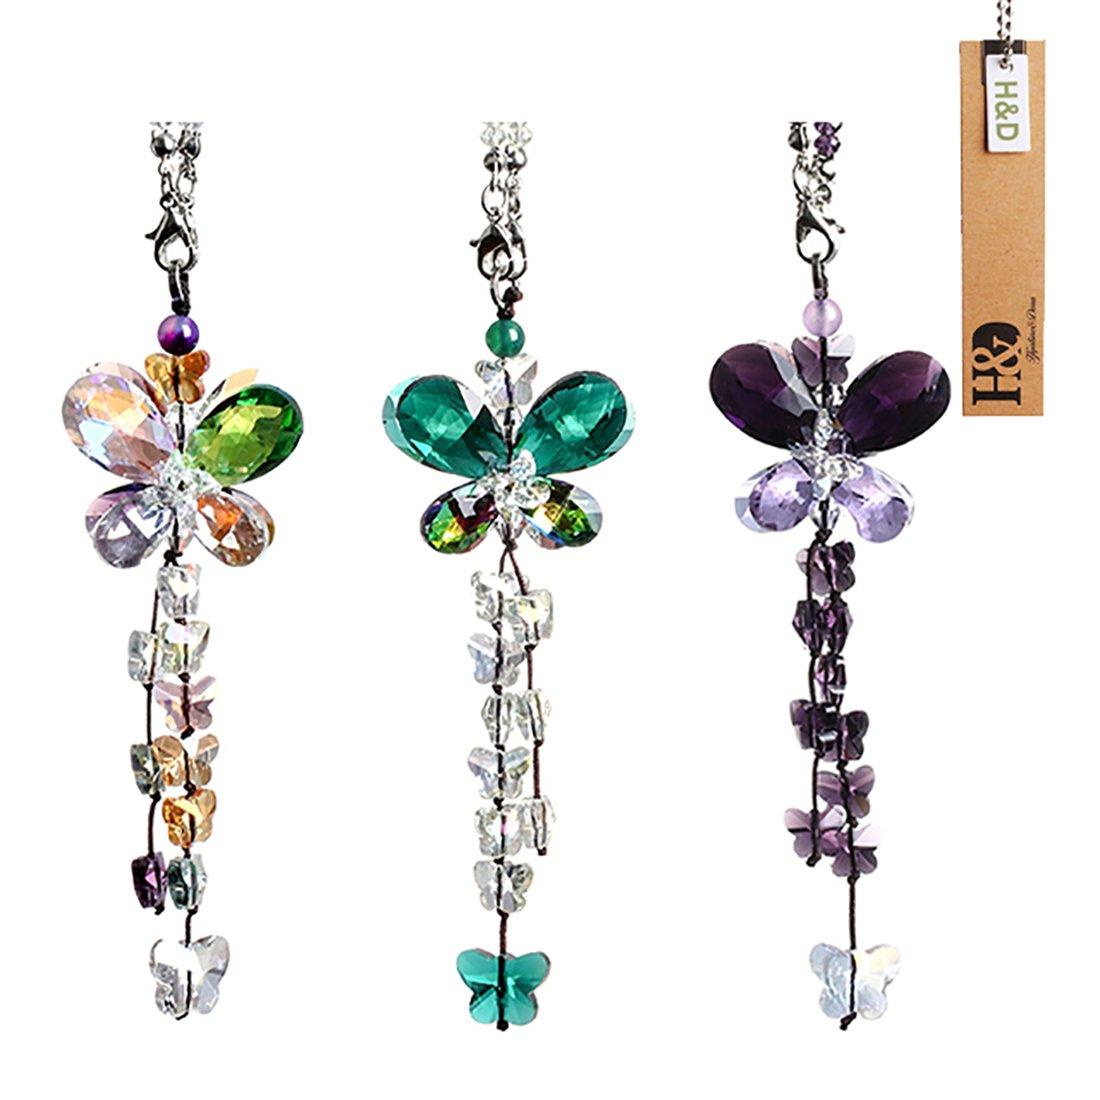 H&D Crystals Ornaments Chandelier Crystals Hanging Prisms Fengshui Suncatcher Rainbow Pendant Maker Car Charm (a set of 3)